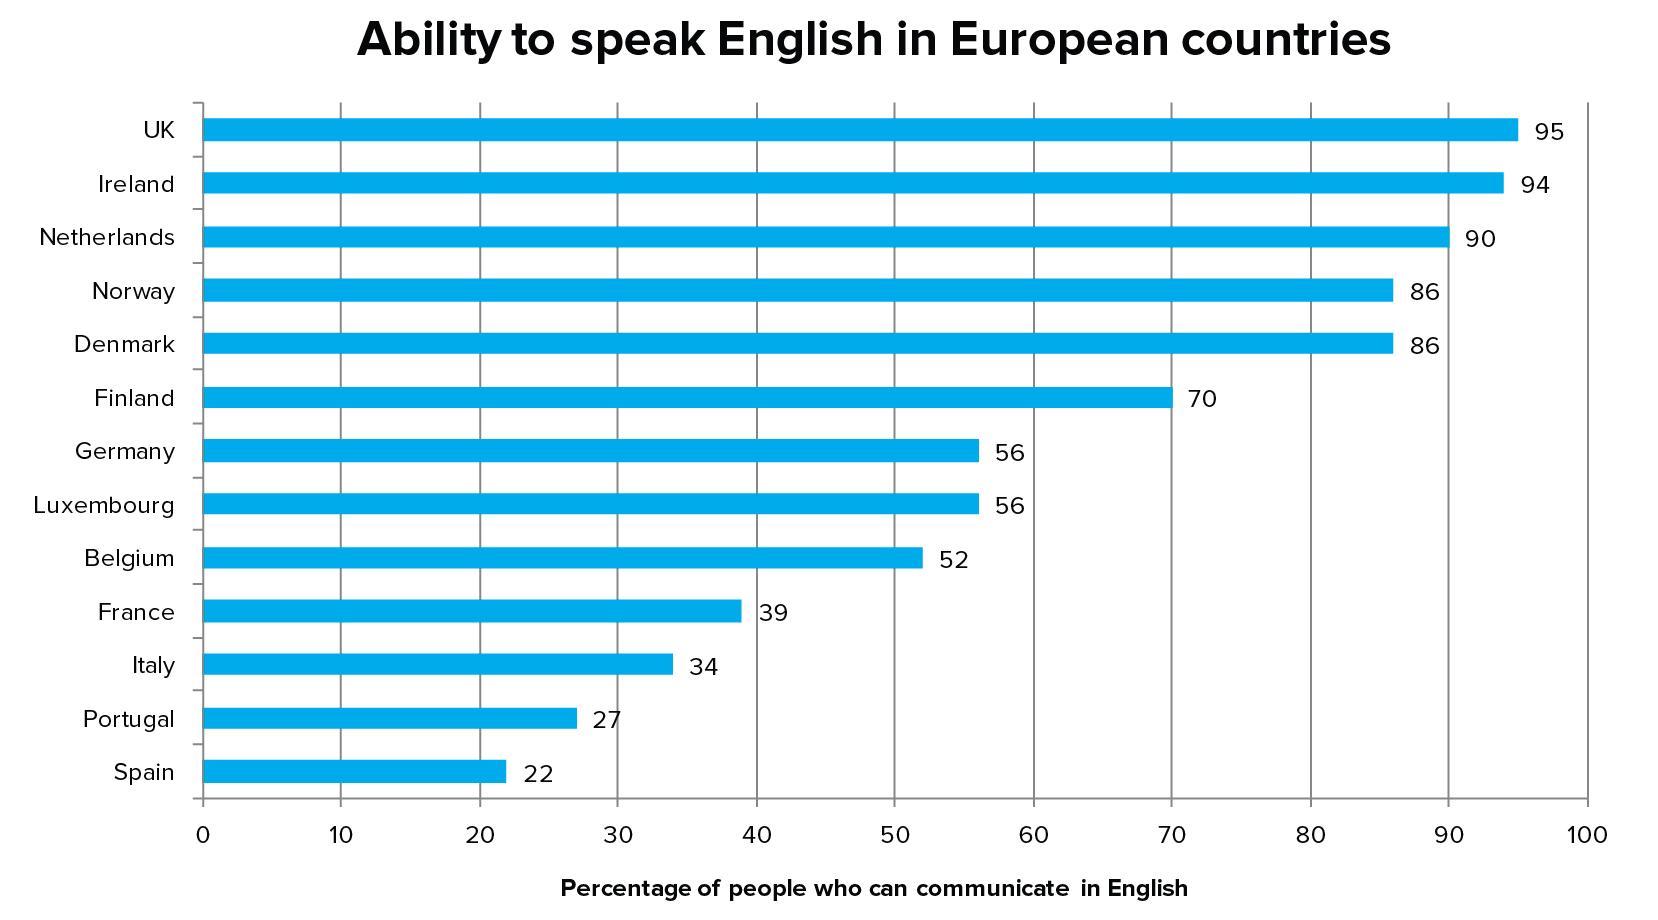 Ability to speak English in European countries